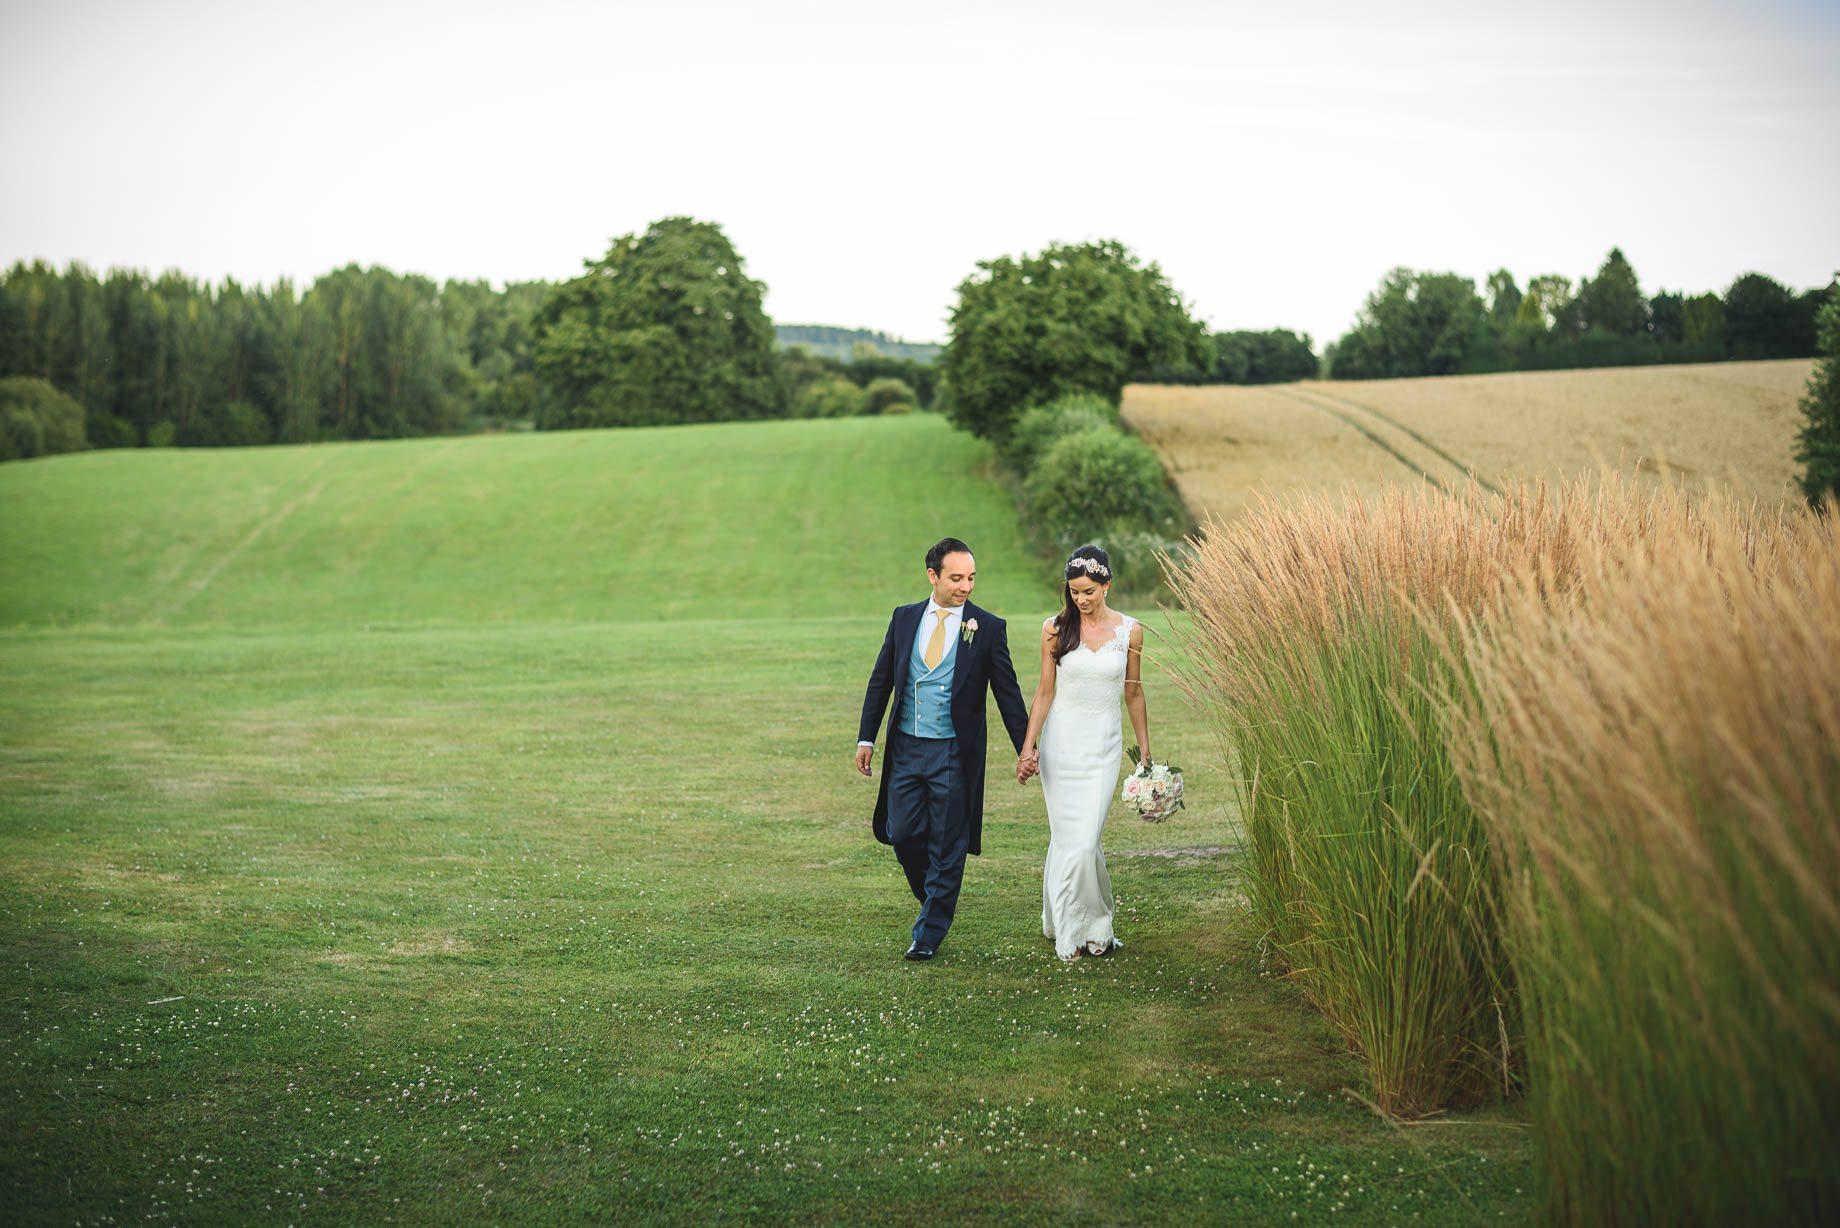 Bury Court Barn Wedding Photography - Caroline and Rob (186 of 219)